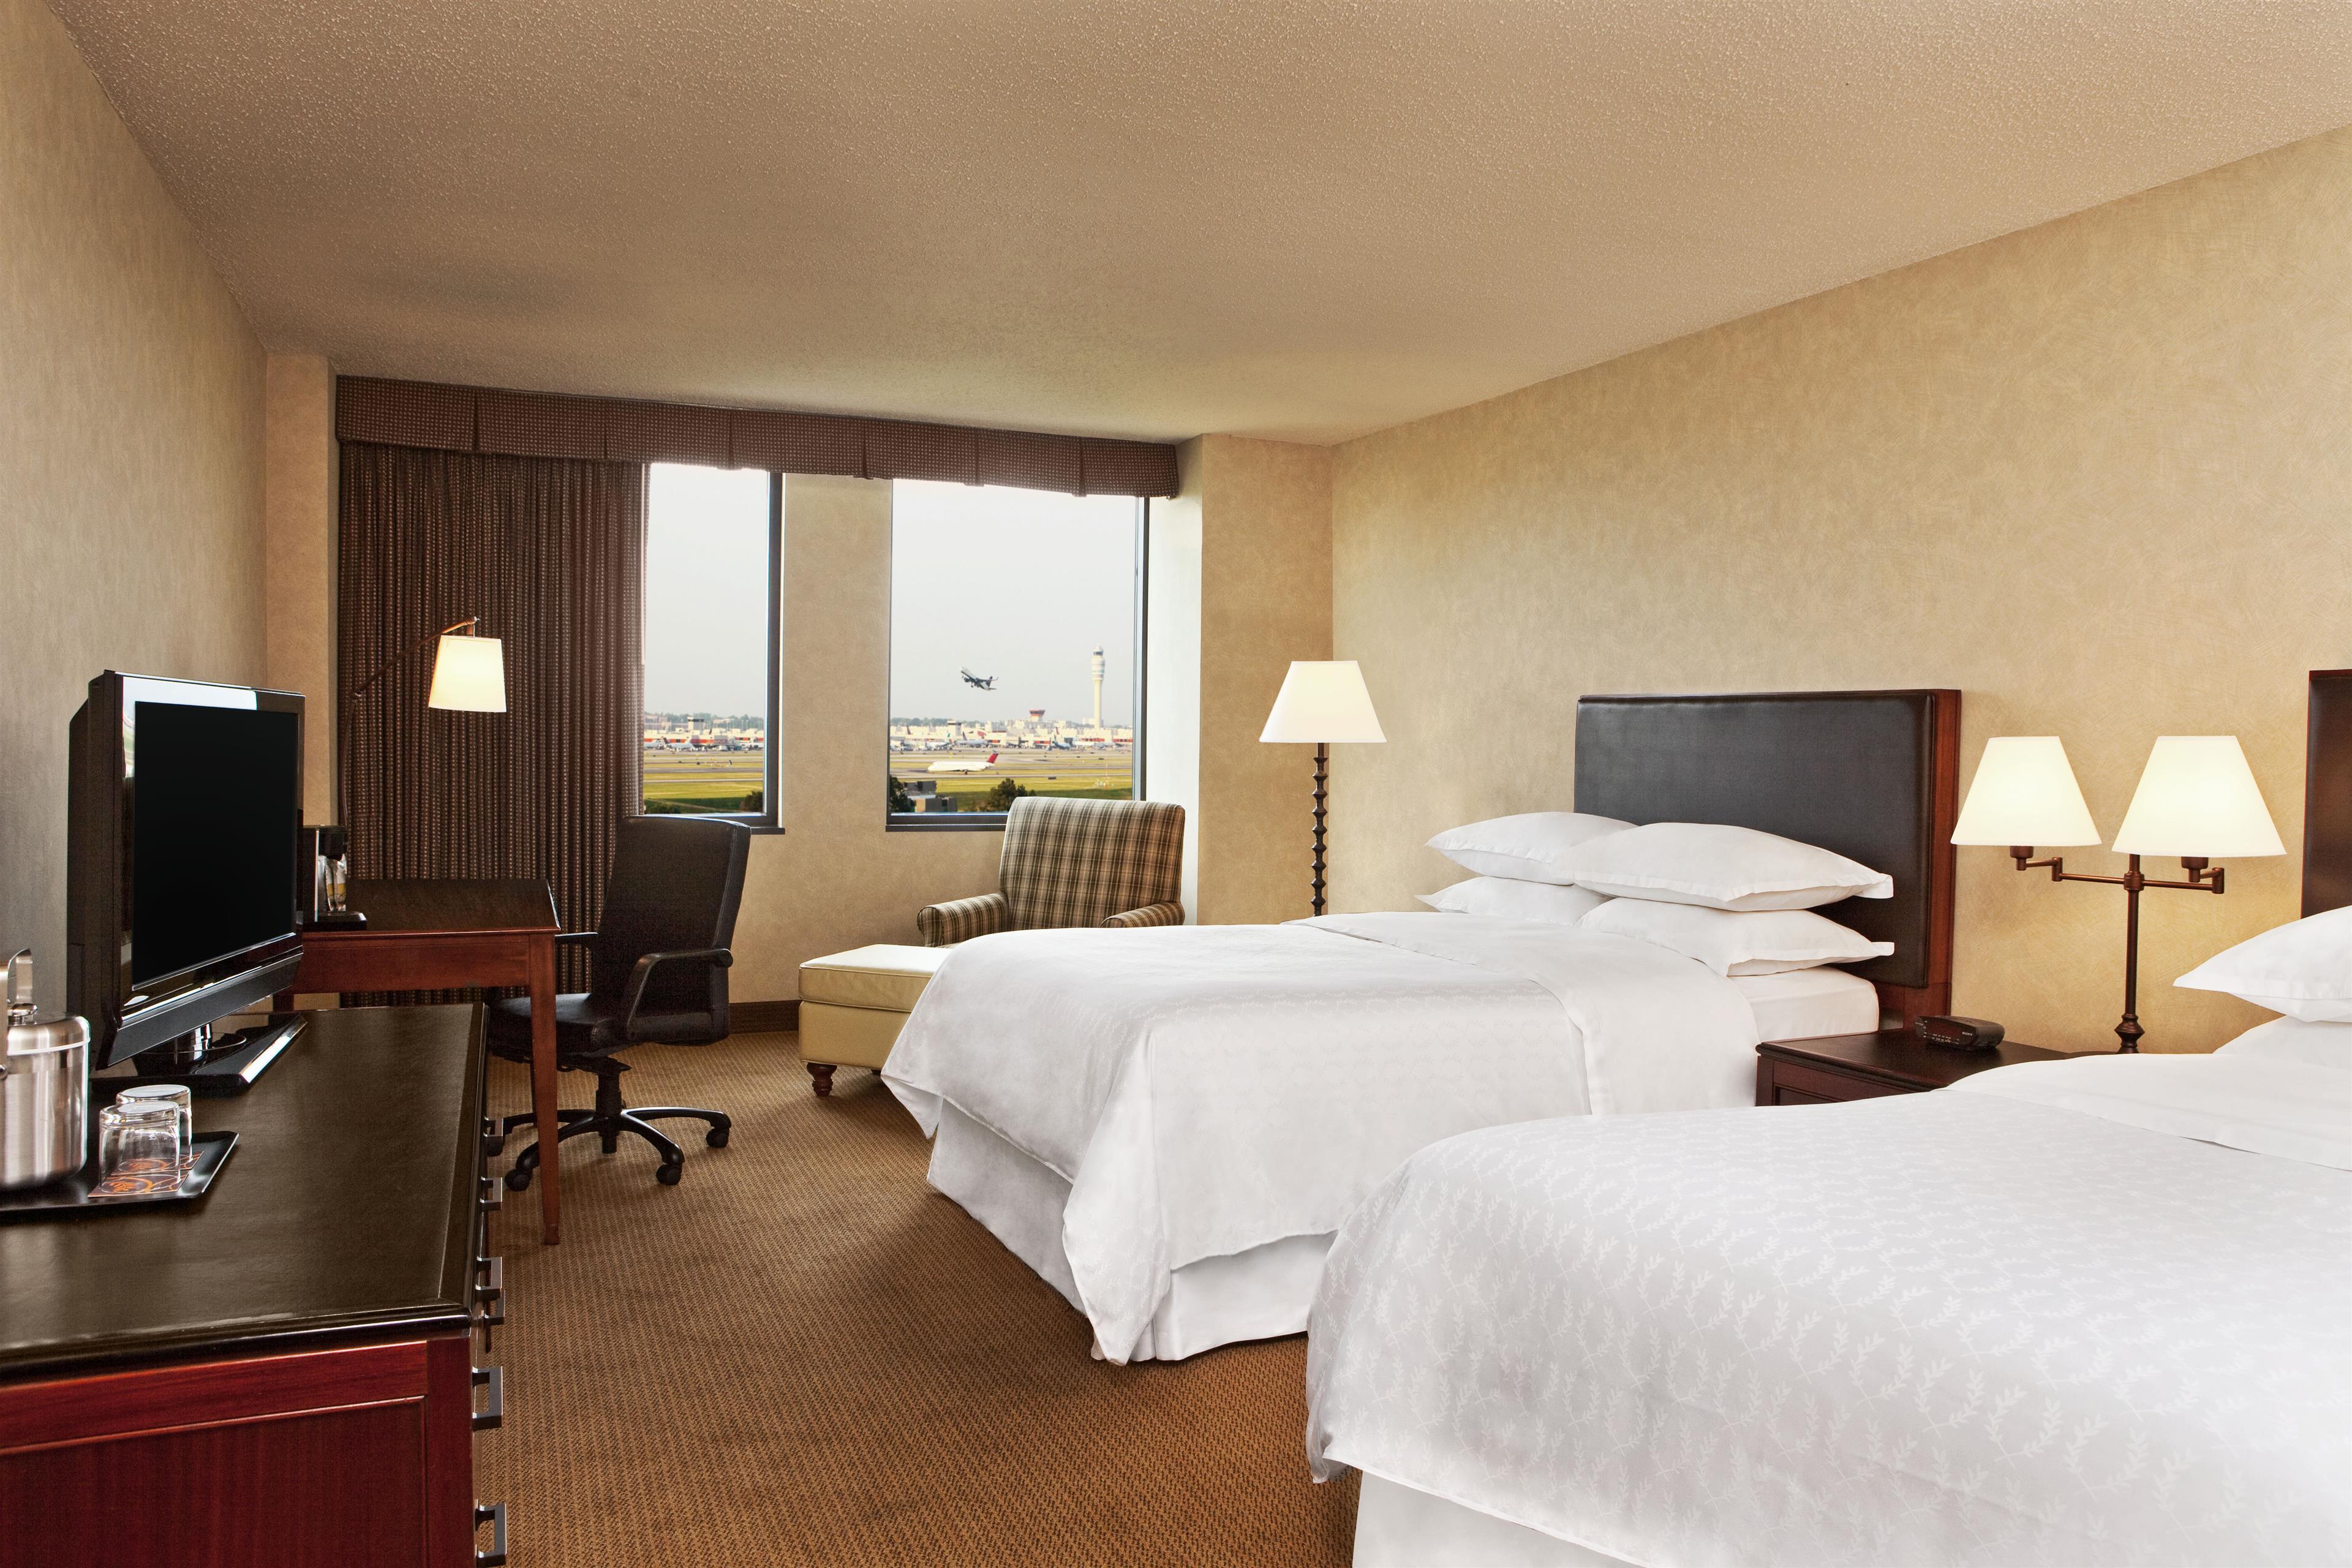 Sheraton Atlanta Airport Hotel image 7